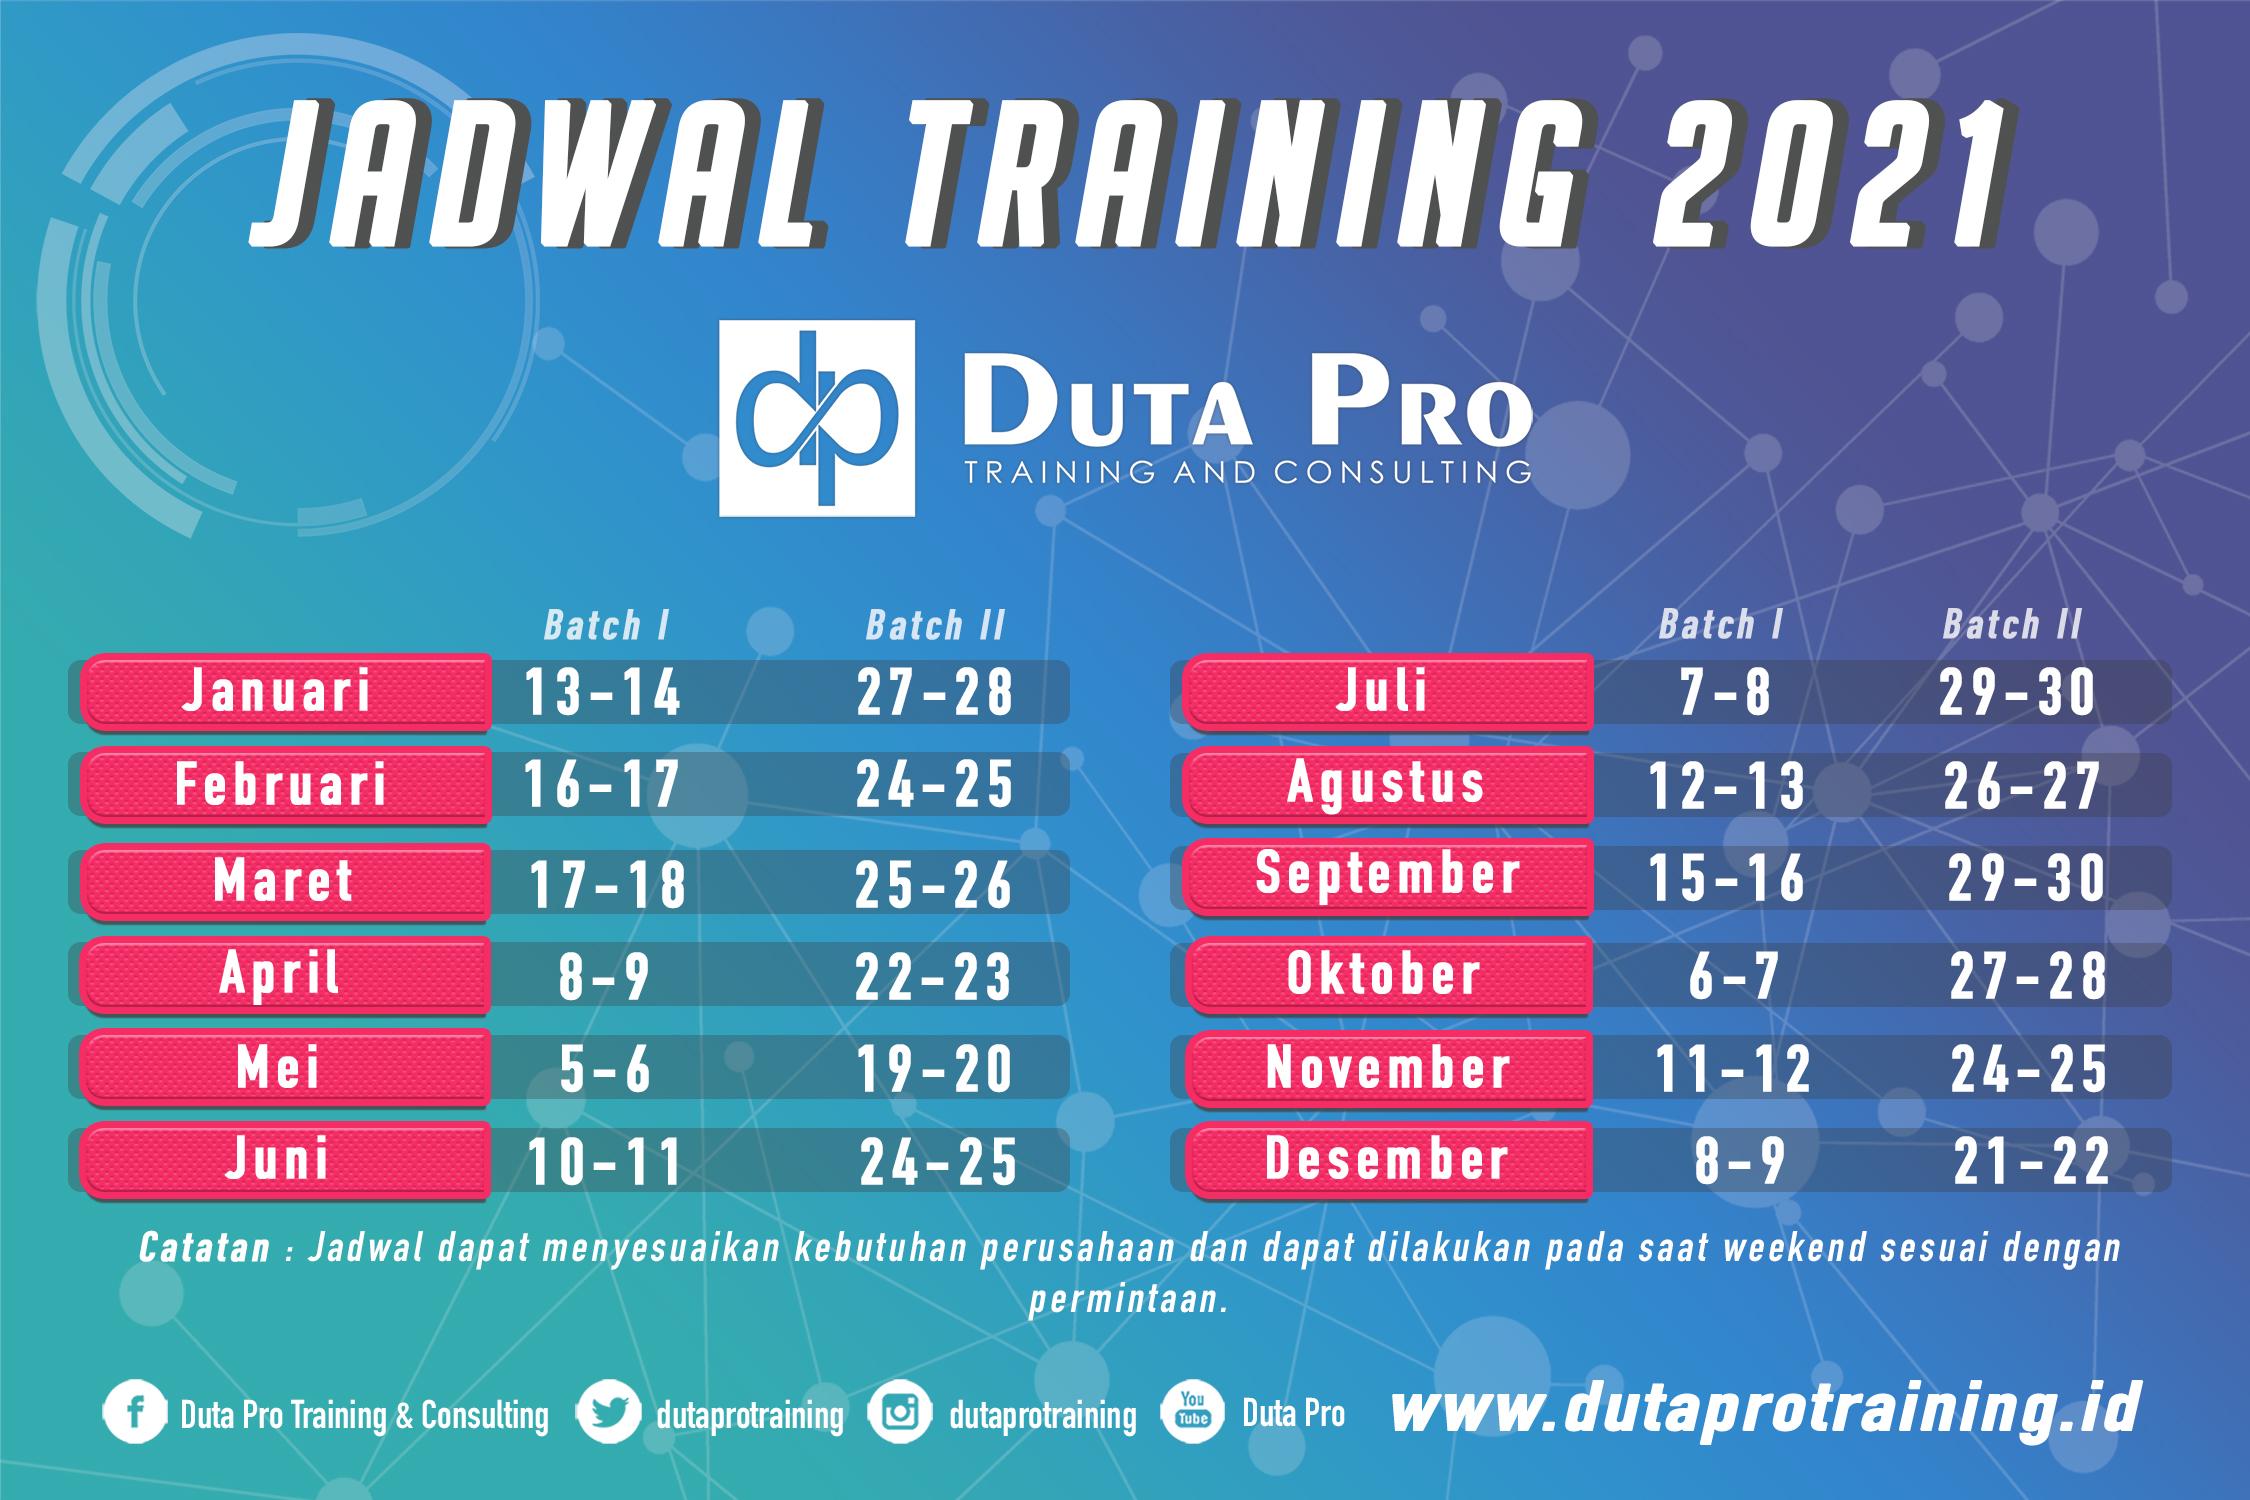 Jadwal Pusat Training 2021 Duta Pro Consulting di Jogja Jakarta Bandung Surabaya Bali Kalimantan - Jadwal Pelatihan 2021